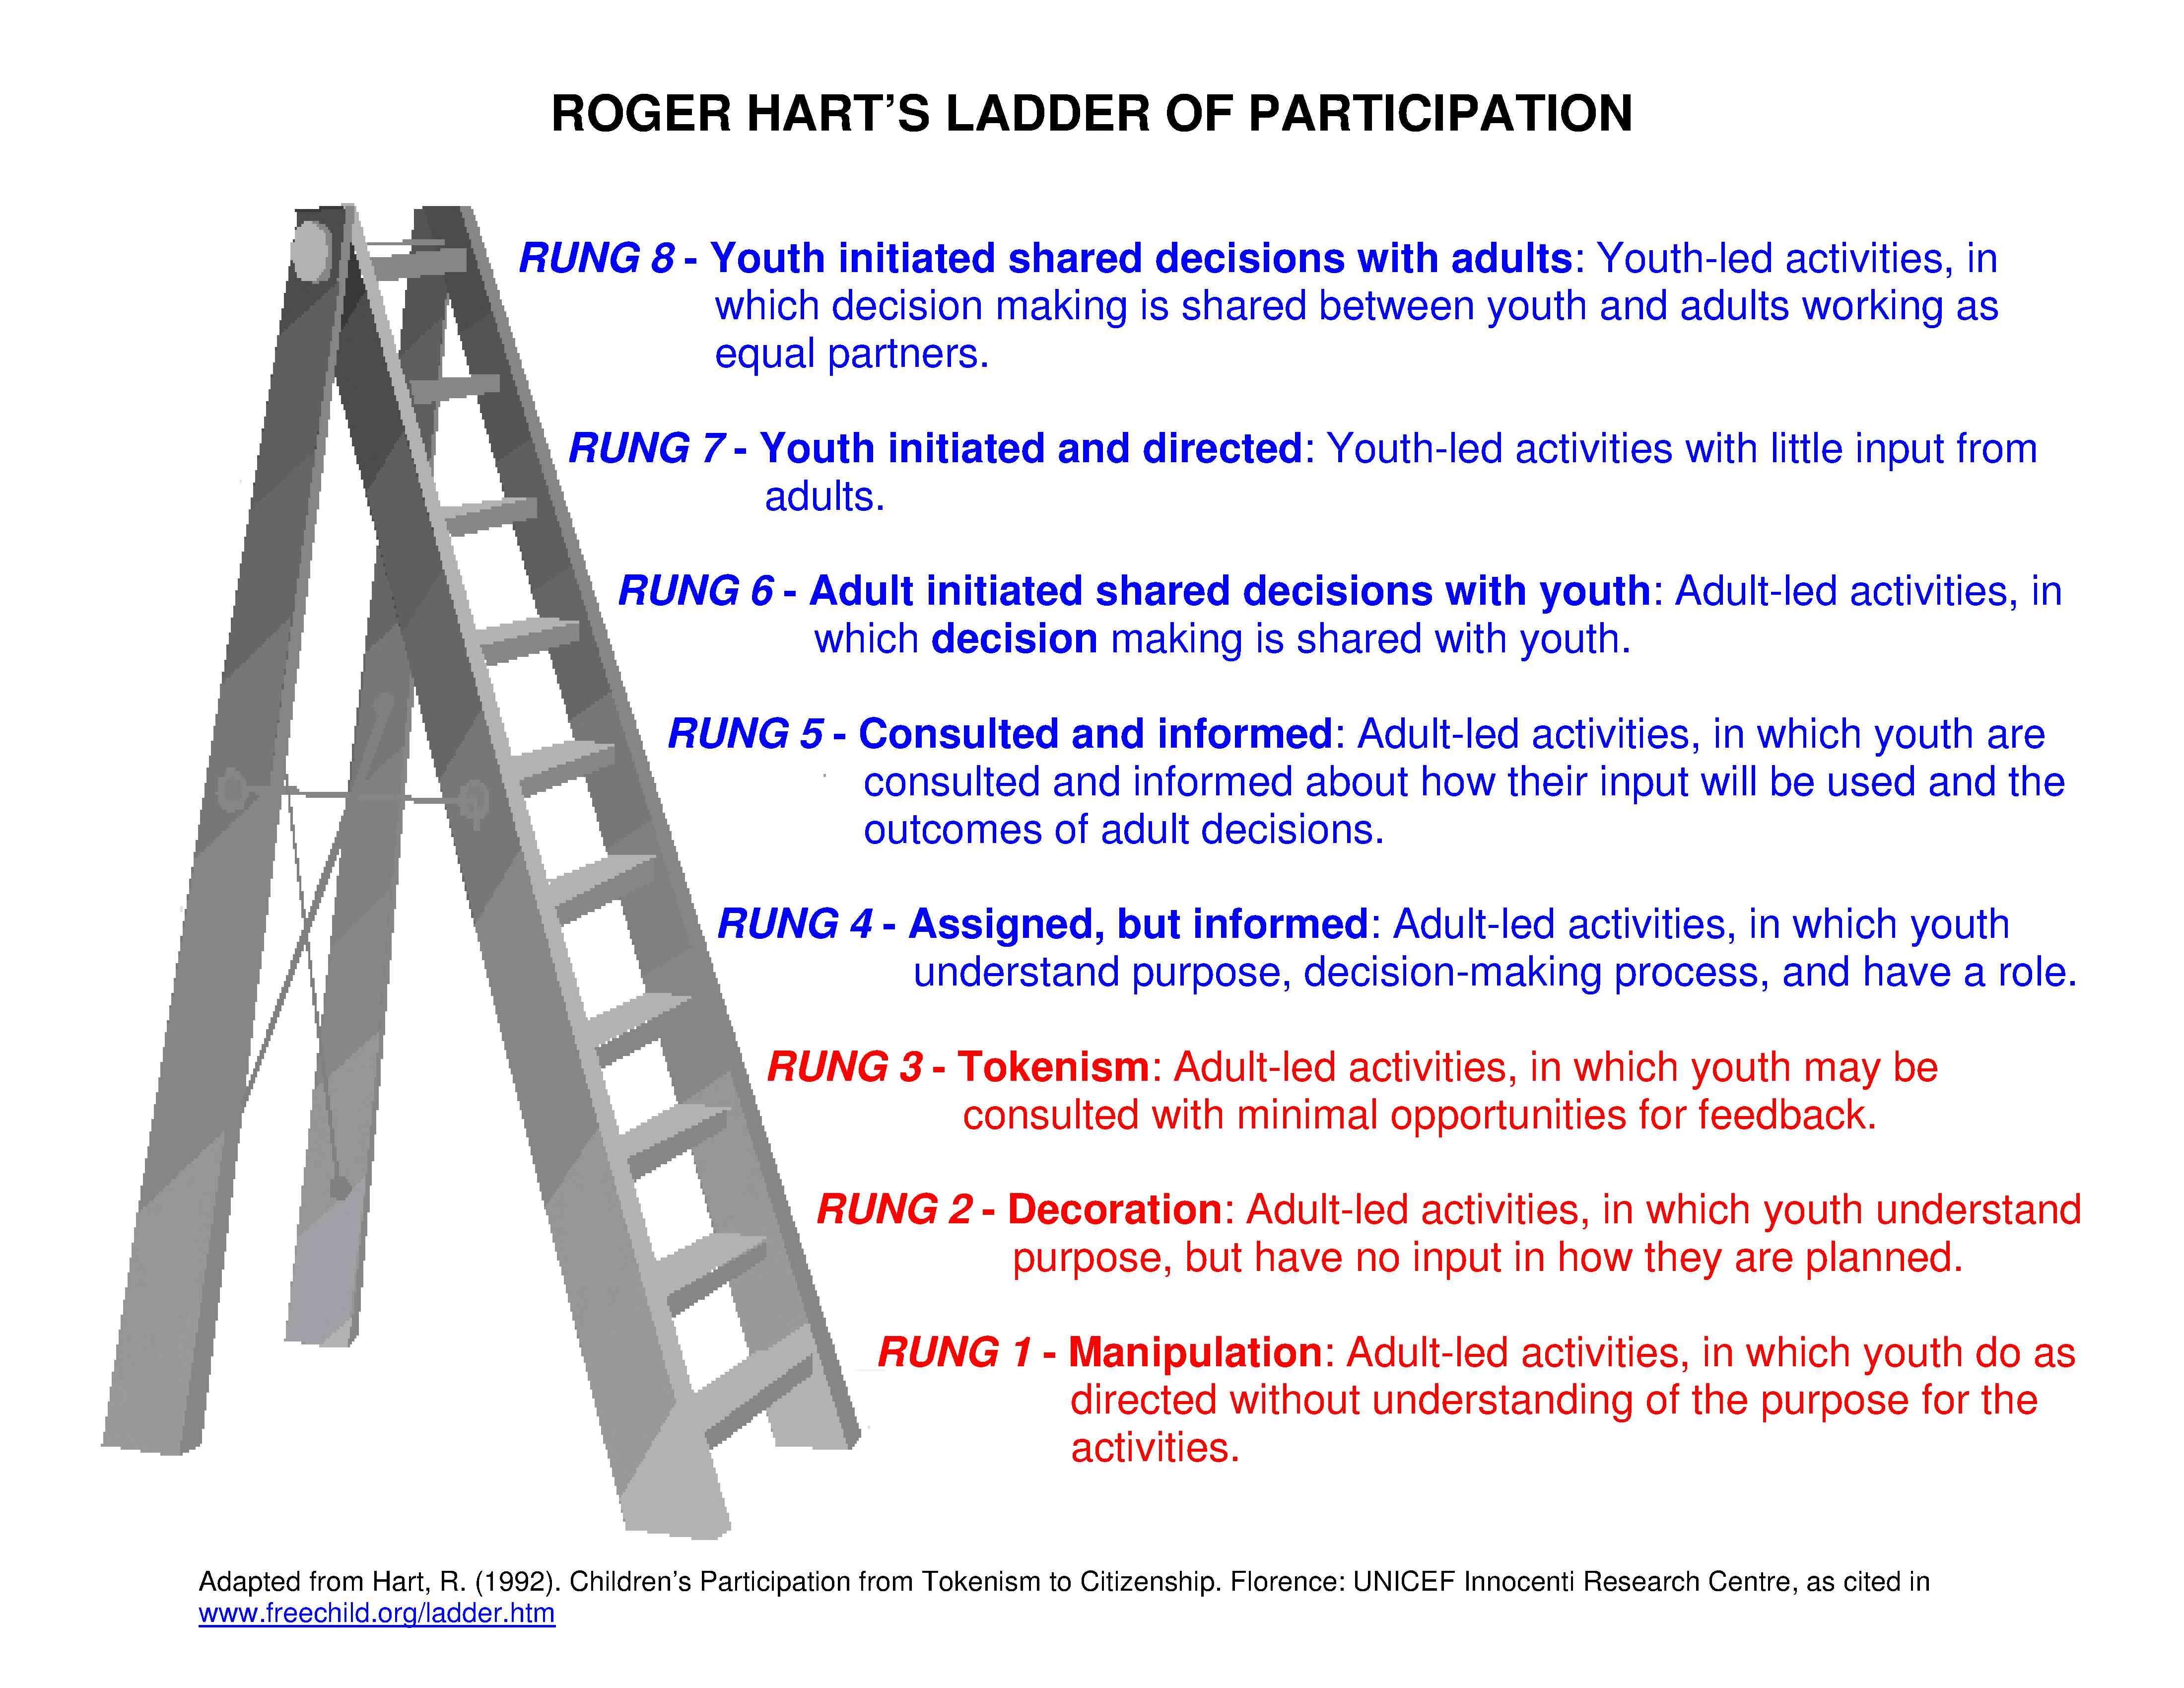 Roger Hart Ladder of Participation